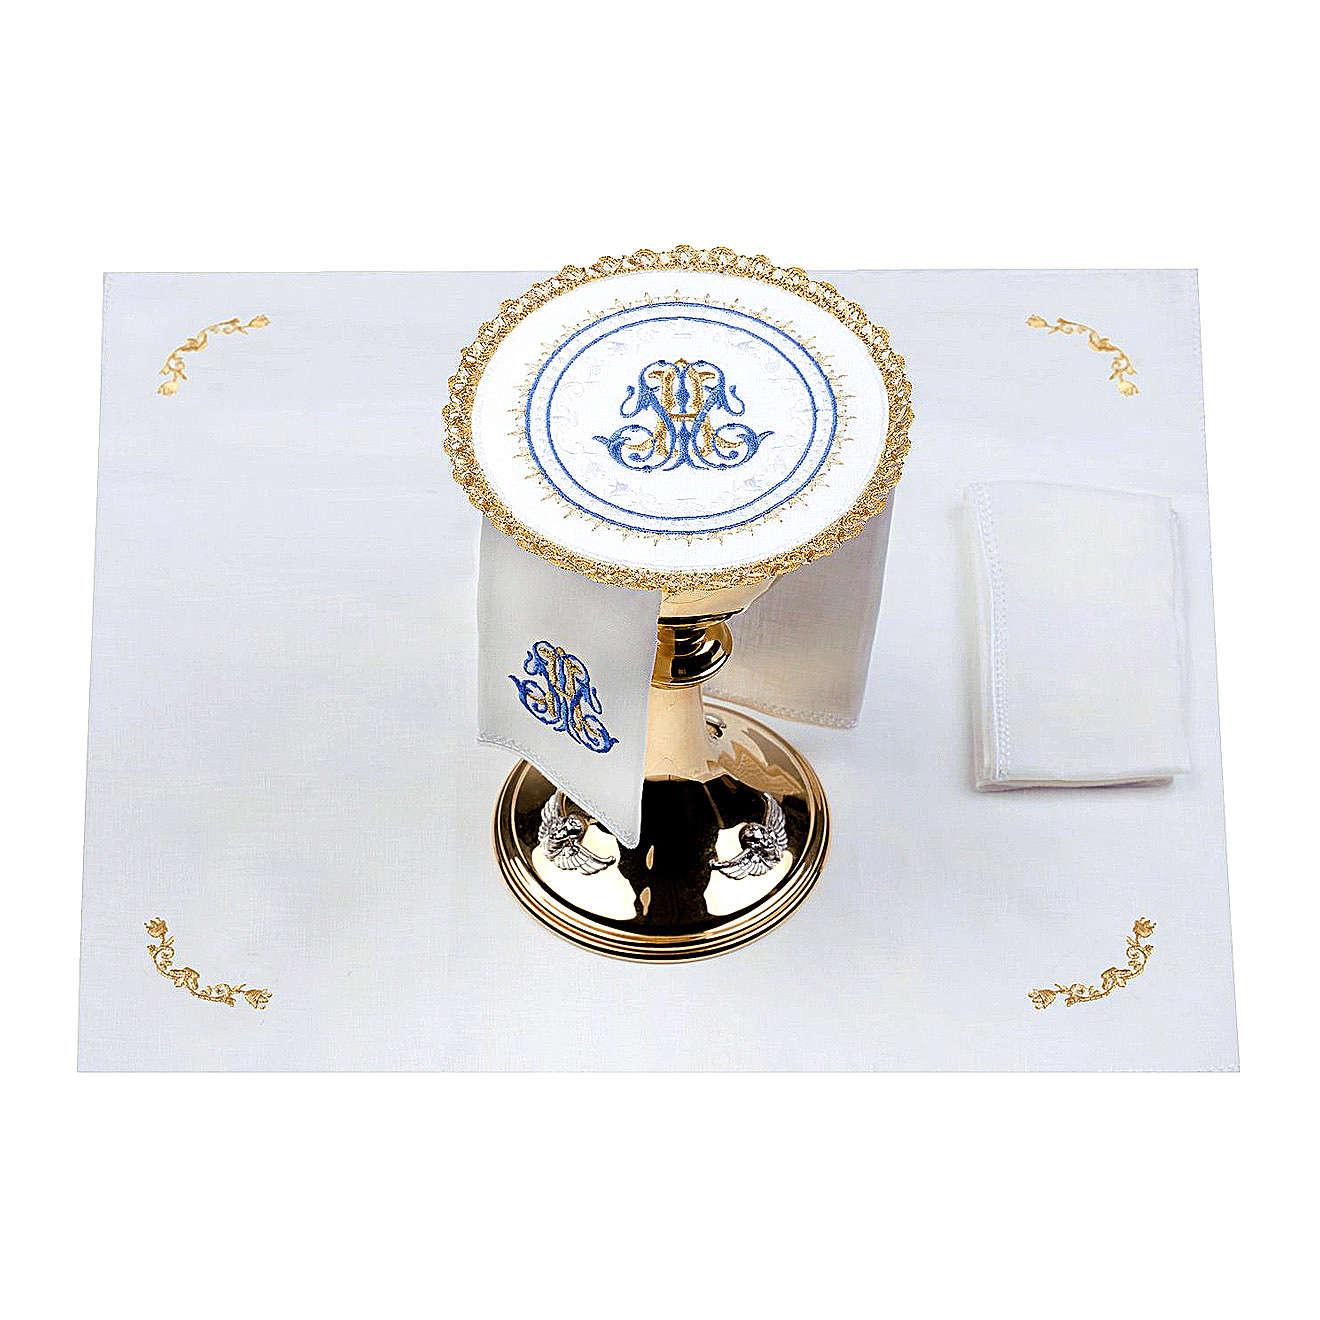 Altar linens set 100% linen Marian symbol, round pall 4